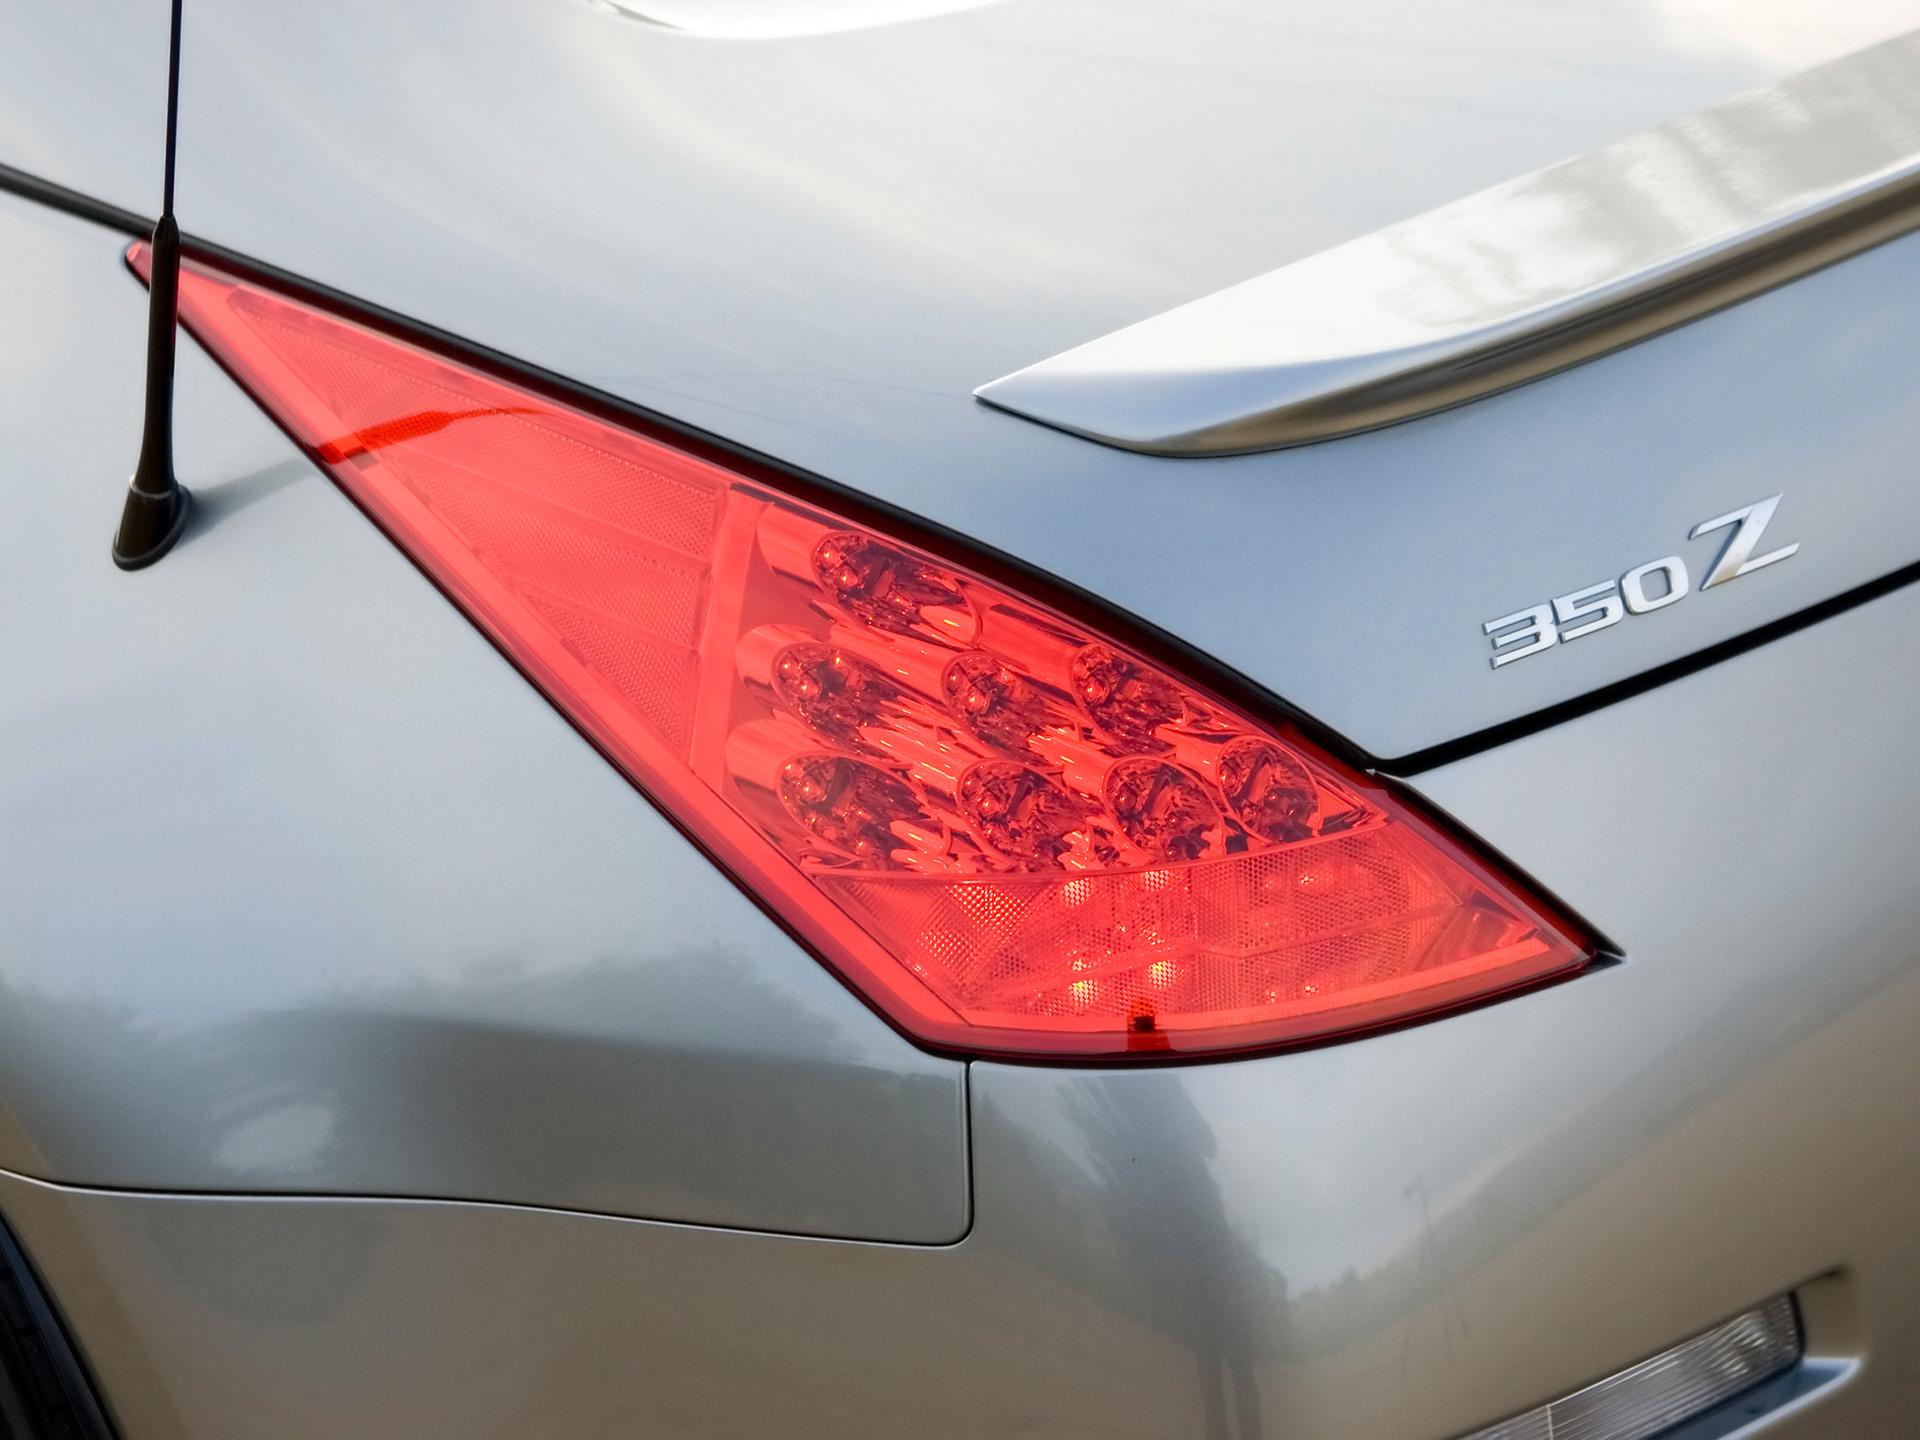 2007-Nissan-350Z-Rear-Light-1920x1440